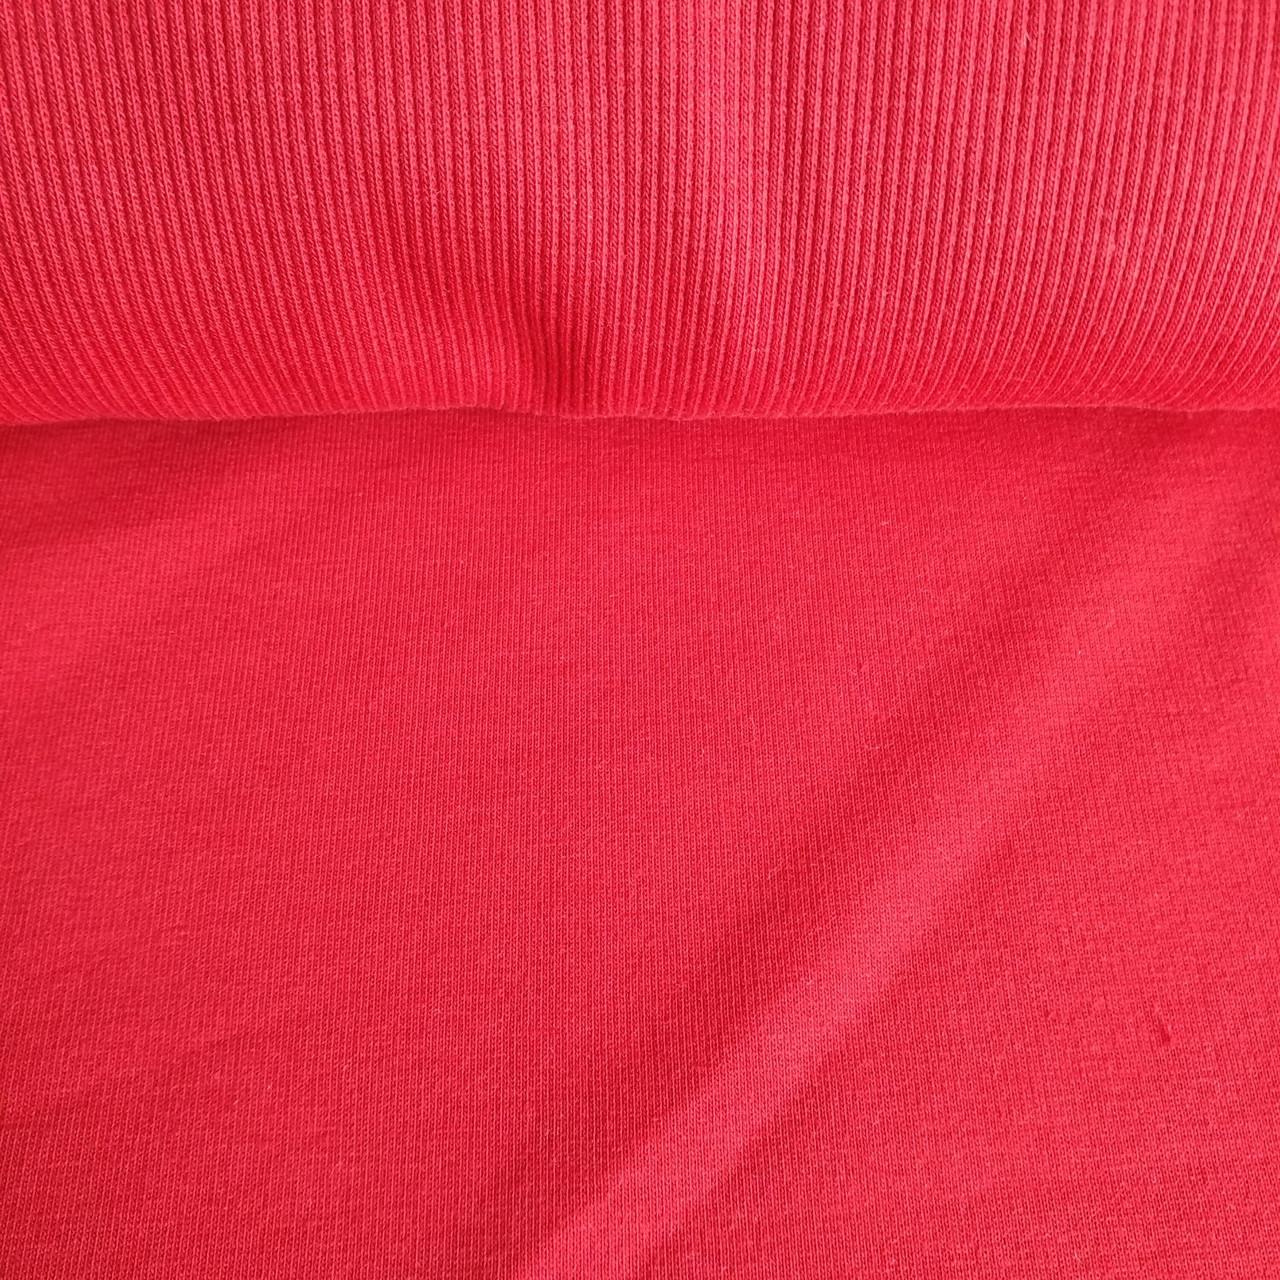 Кашкорсе для футера Красный, чулок 60см.